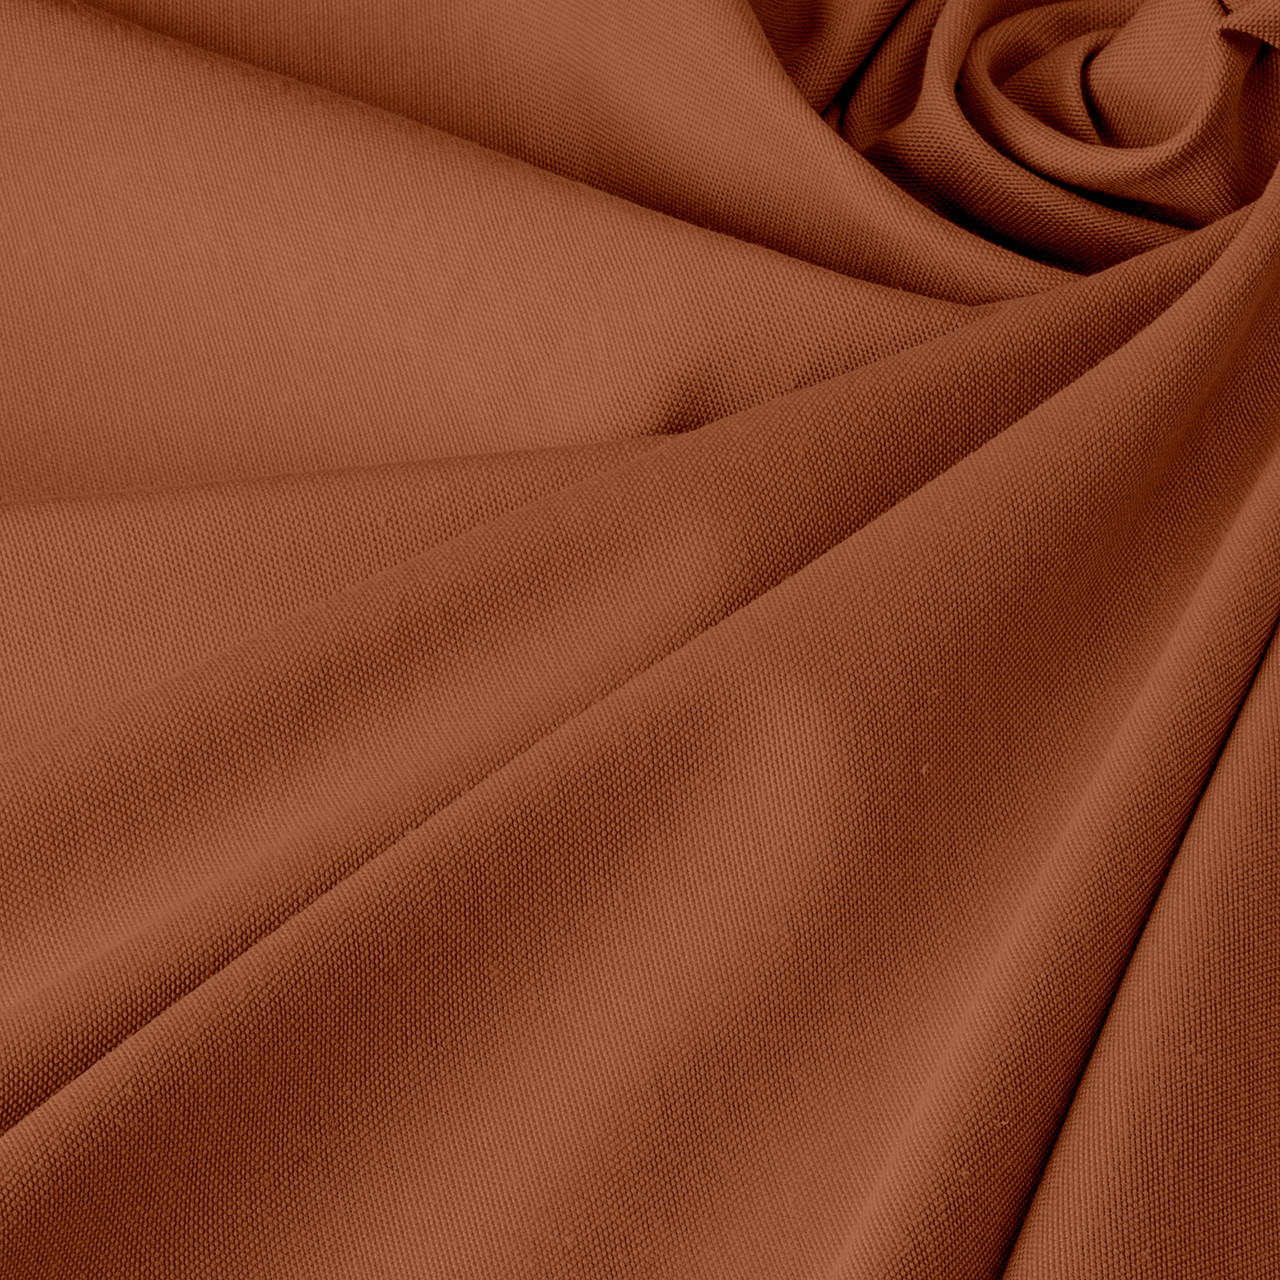 Однотонная декоративная ткань коричневого цвета Турция DRK-84597